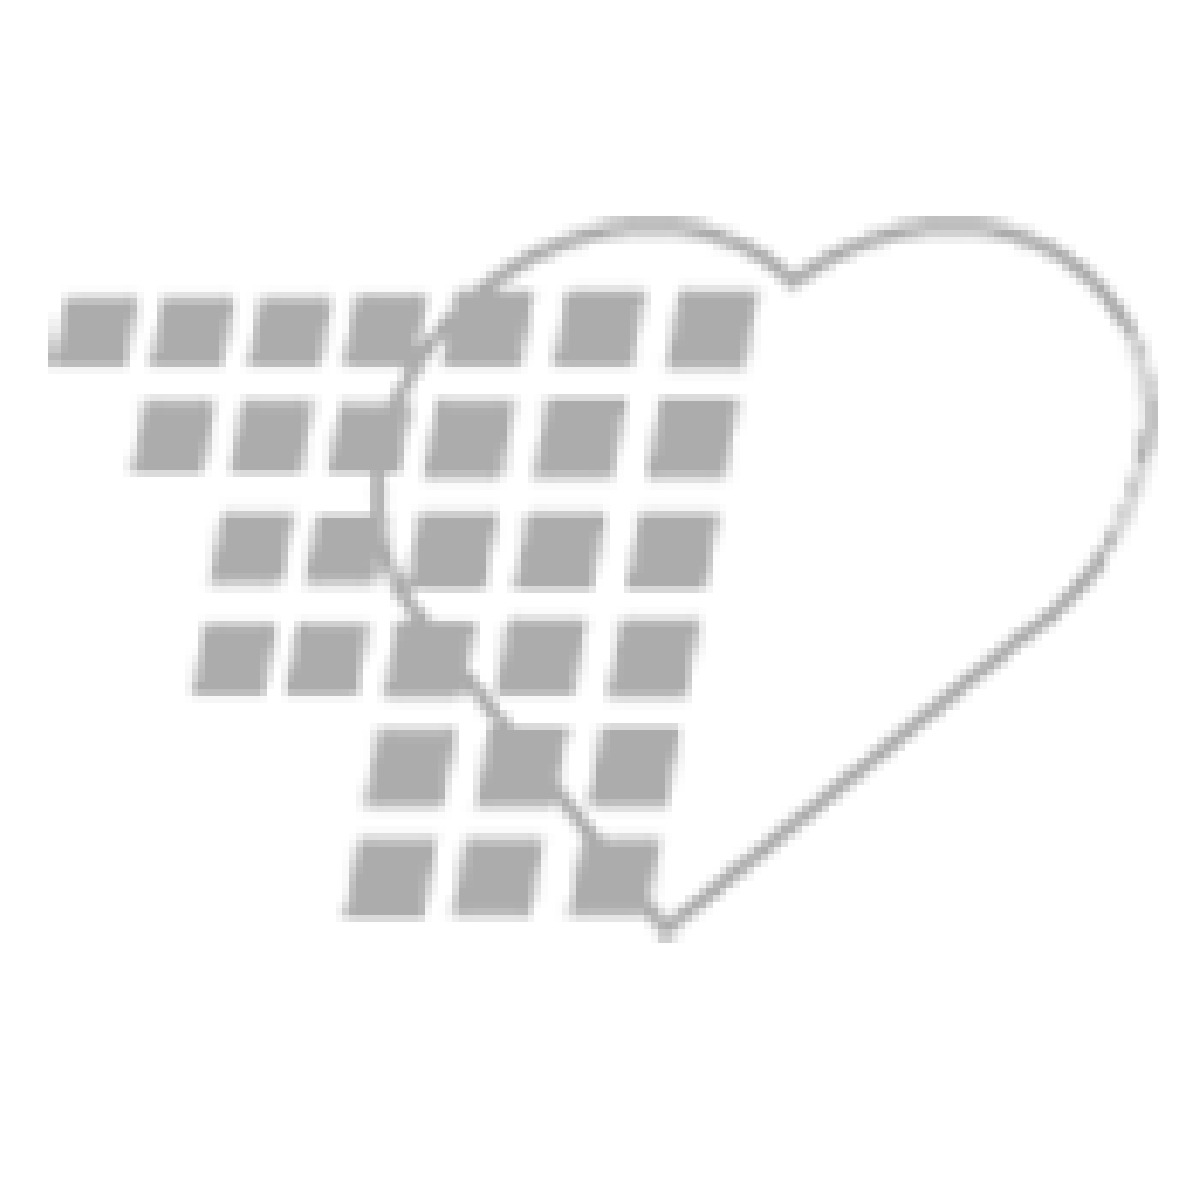 "06-21-8215 Portex® Multi-Sample Blood Collection Needle 21G x 1.5"""